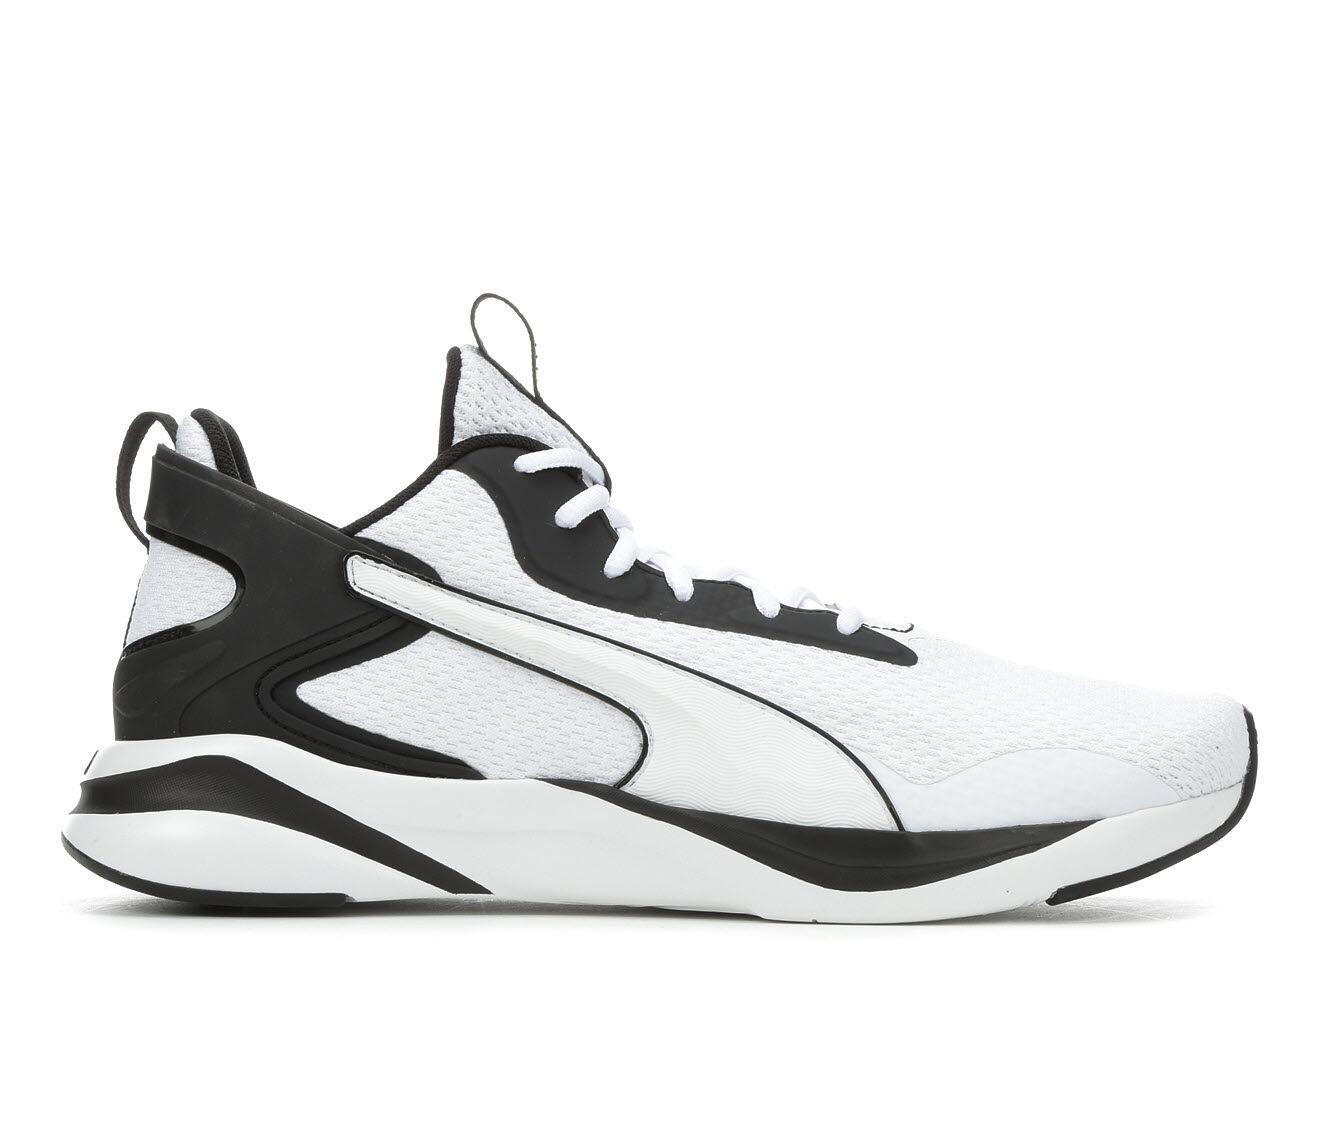 Men's Puma Softride Rift Tech Sneakers